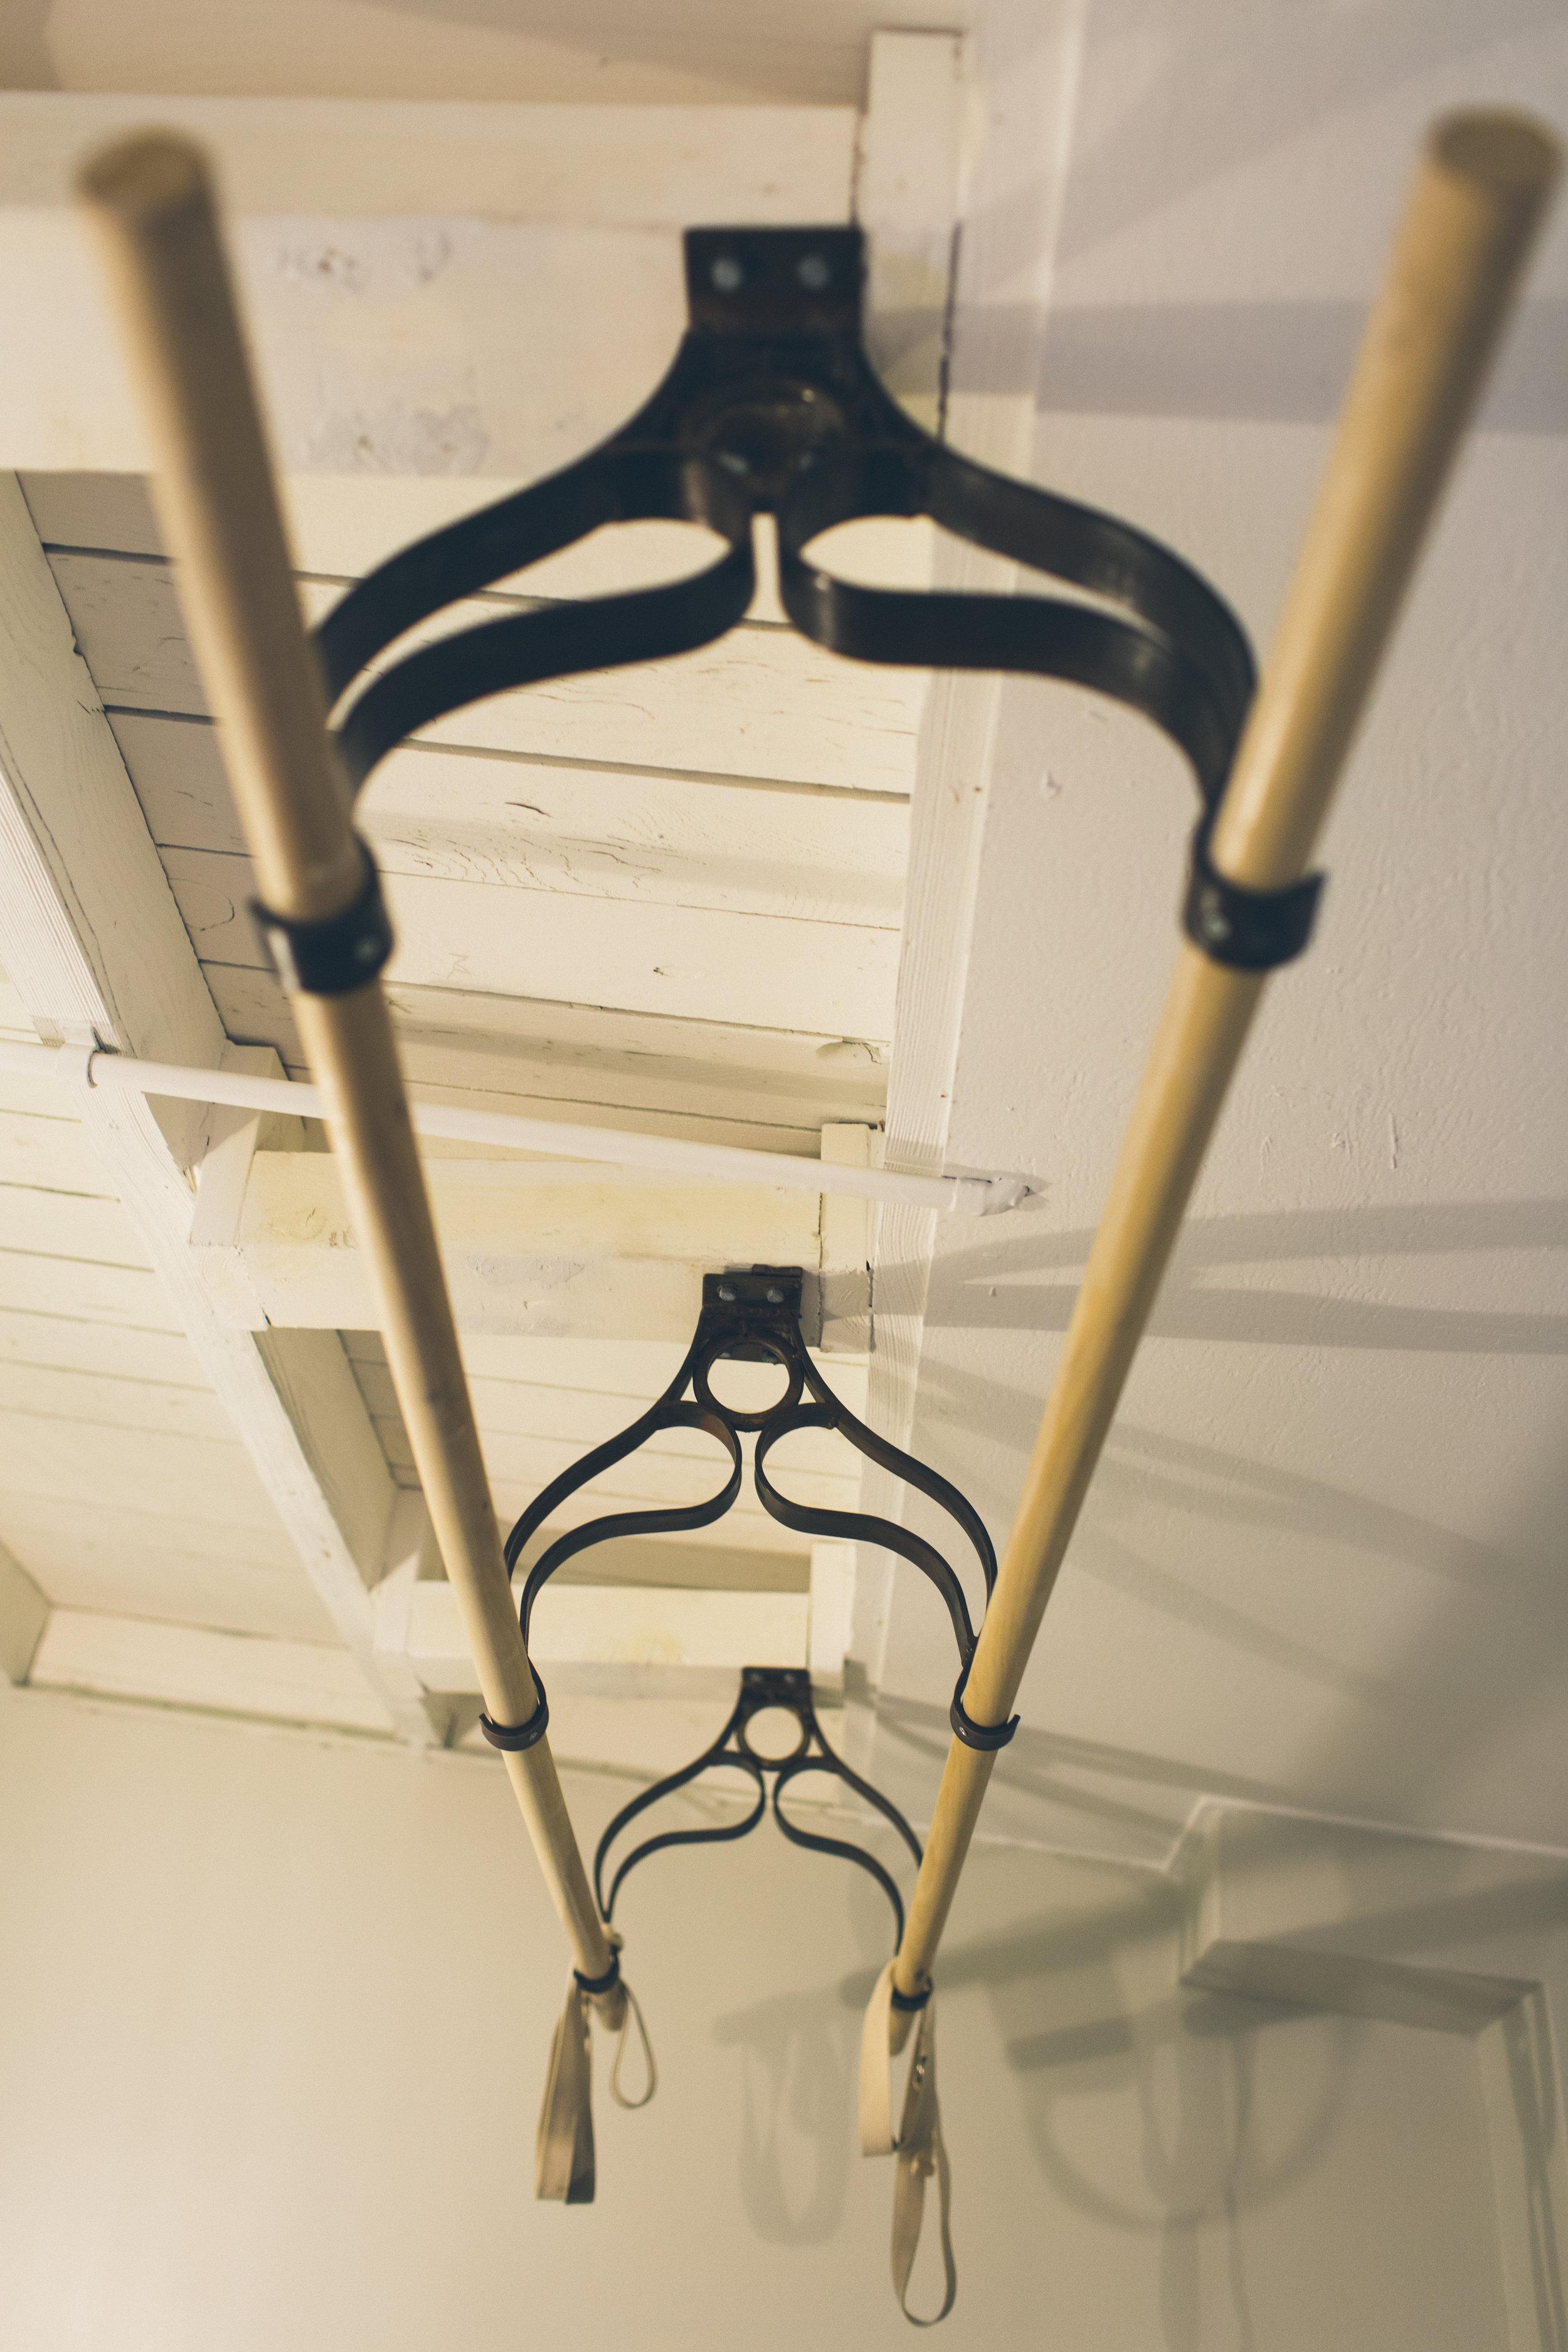 Barefoot-MMPhoto-massage room bars.jpg